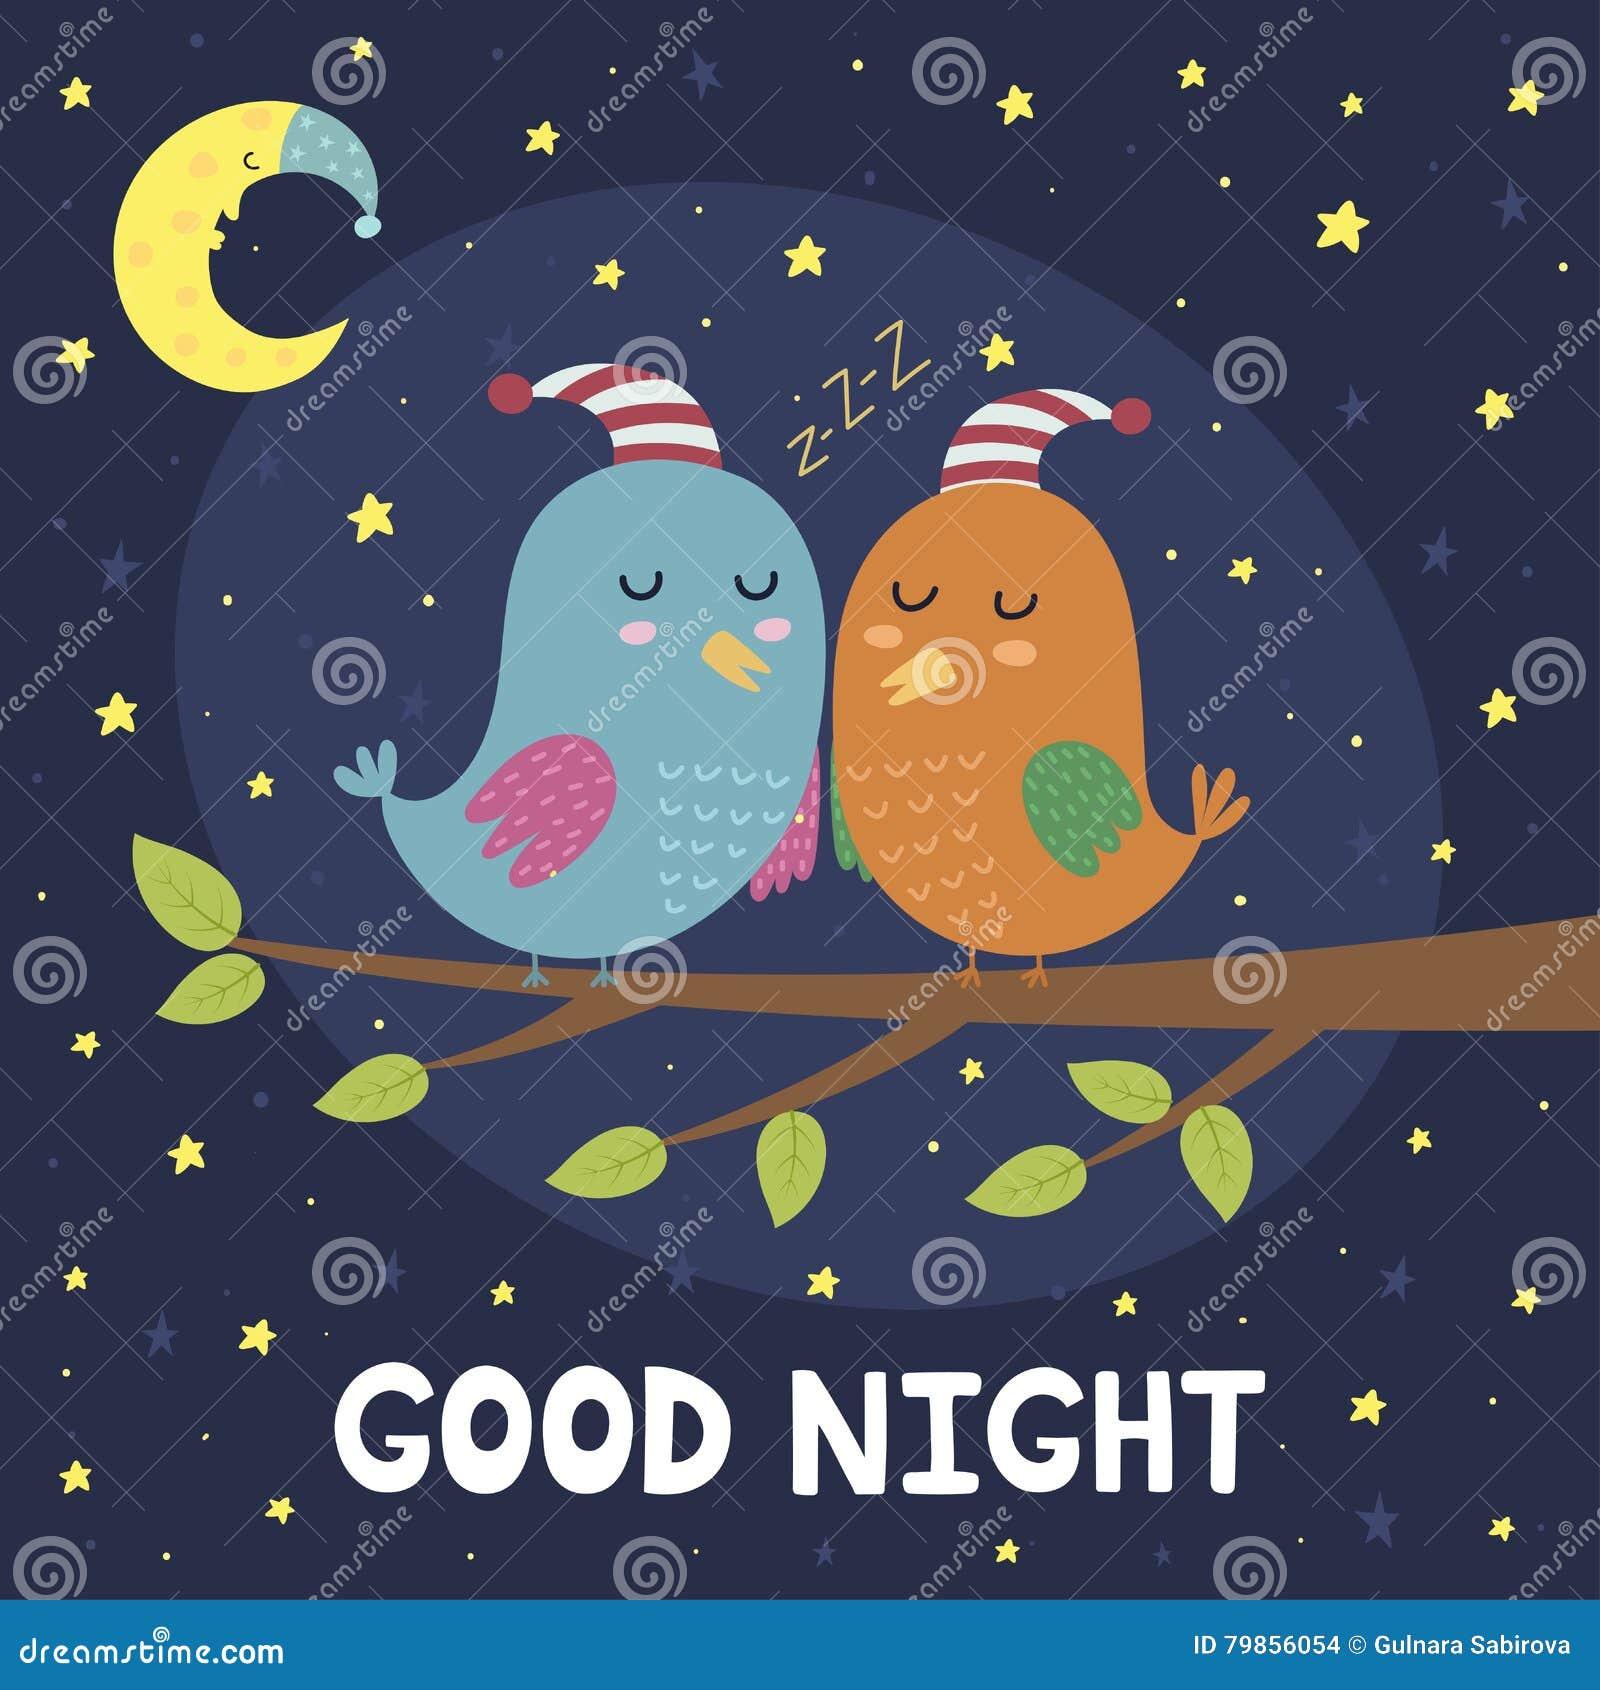 Good Night Card With Cute Sleeping Birds Stock Vector Illustration